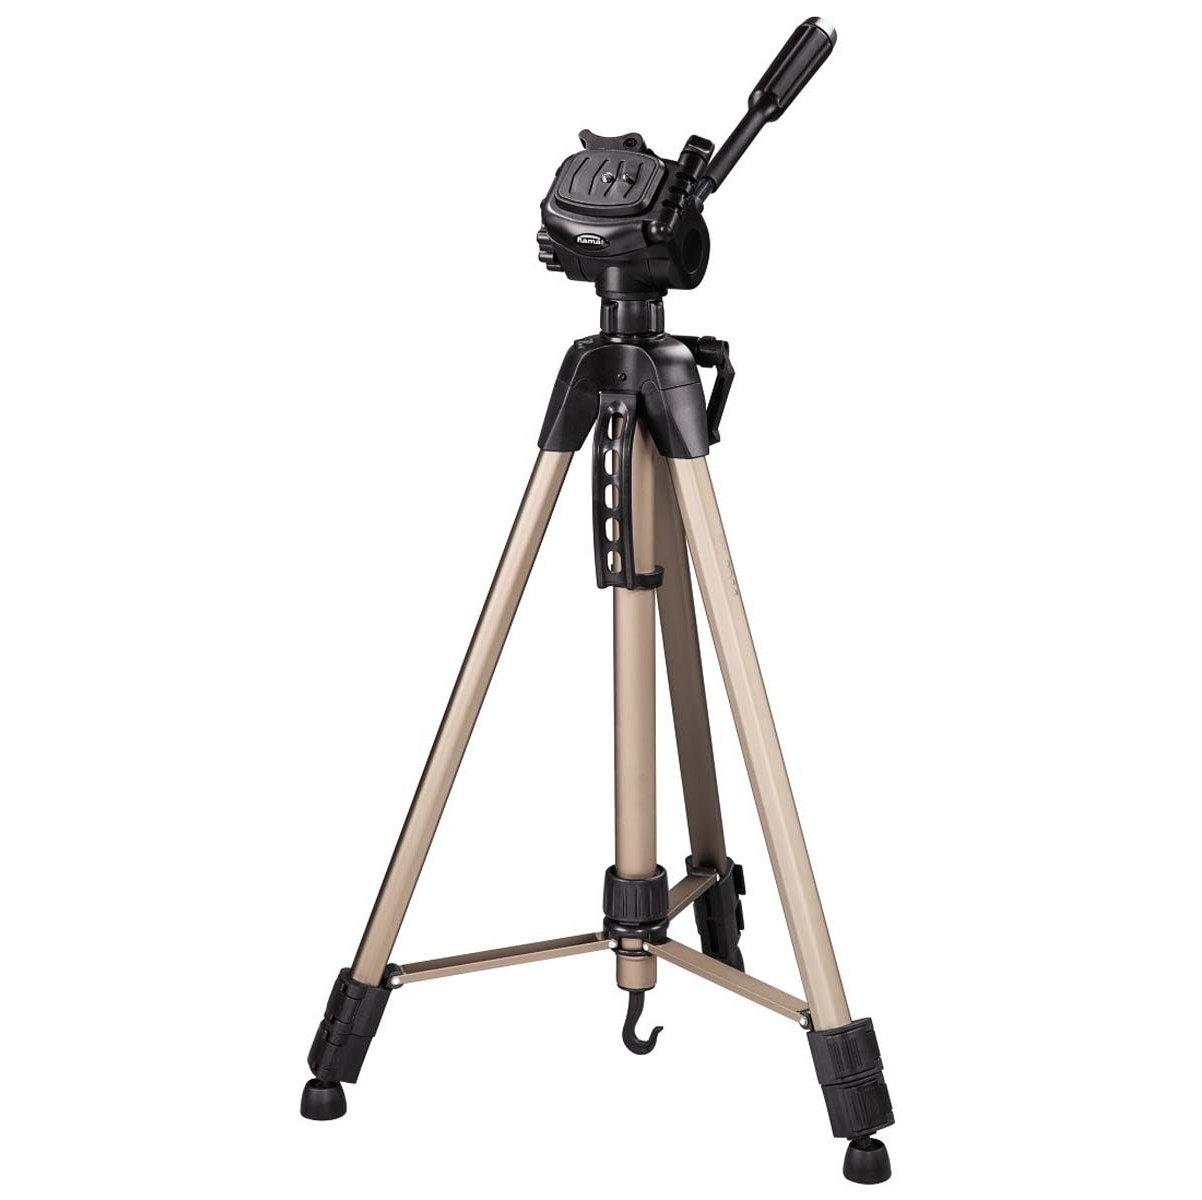 Hama Products Star 62 Aluminium Camera Tripod With Carry Case